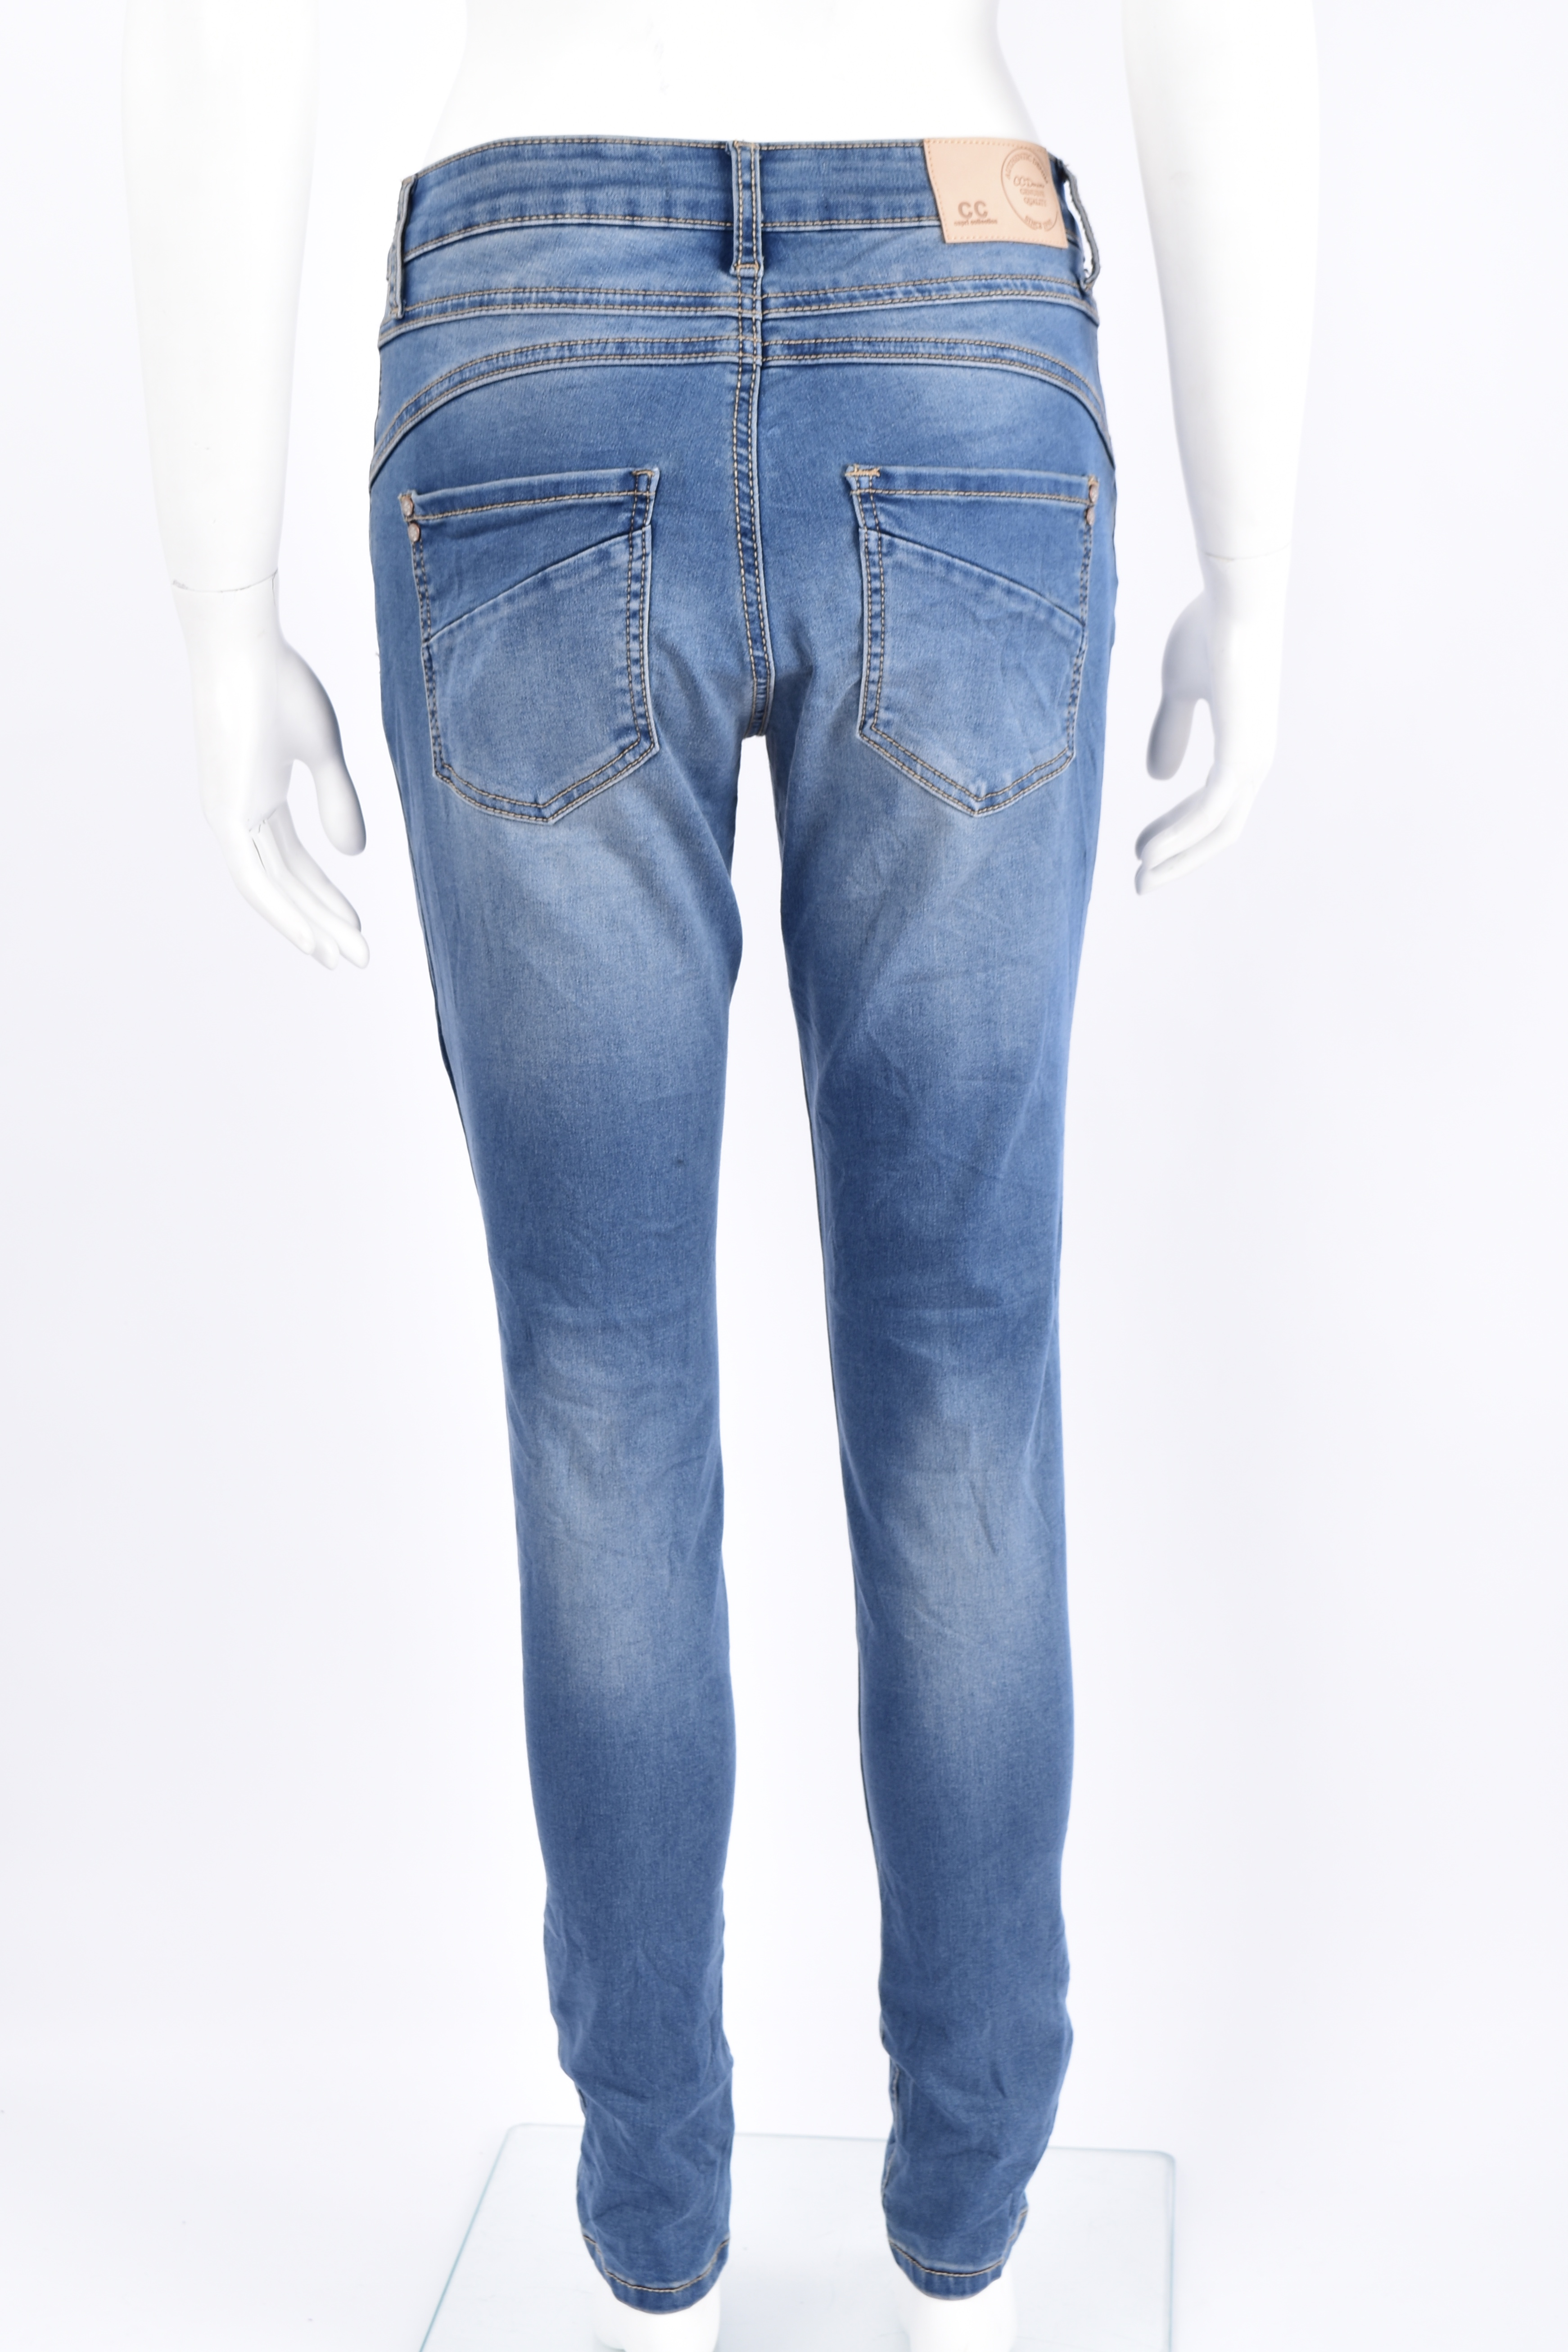 Canyon jeans